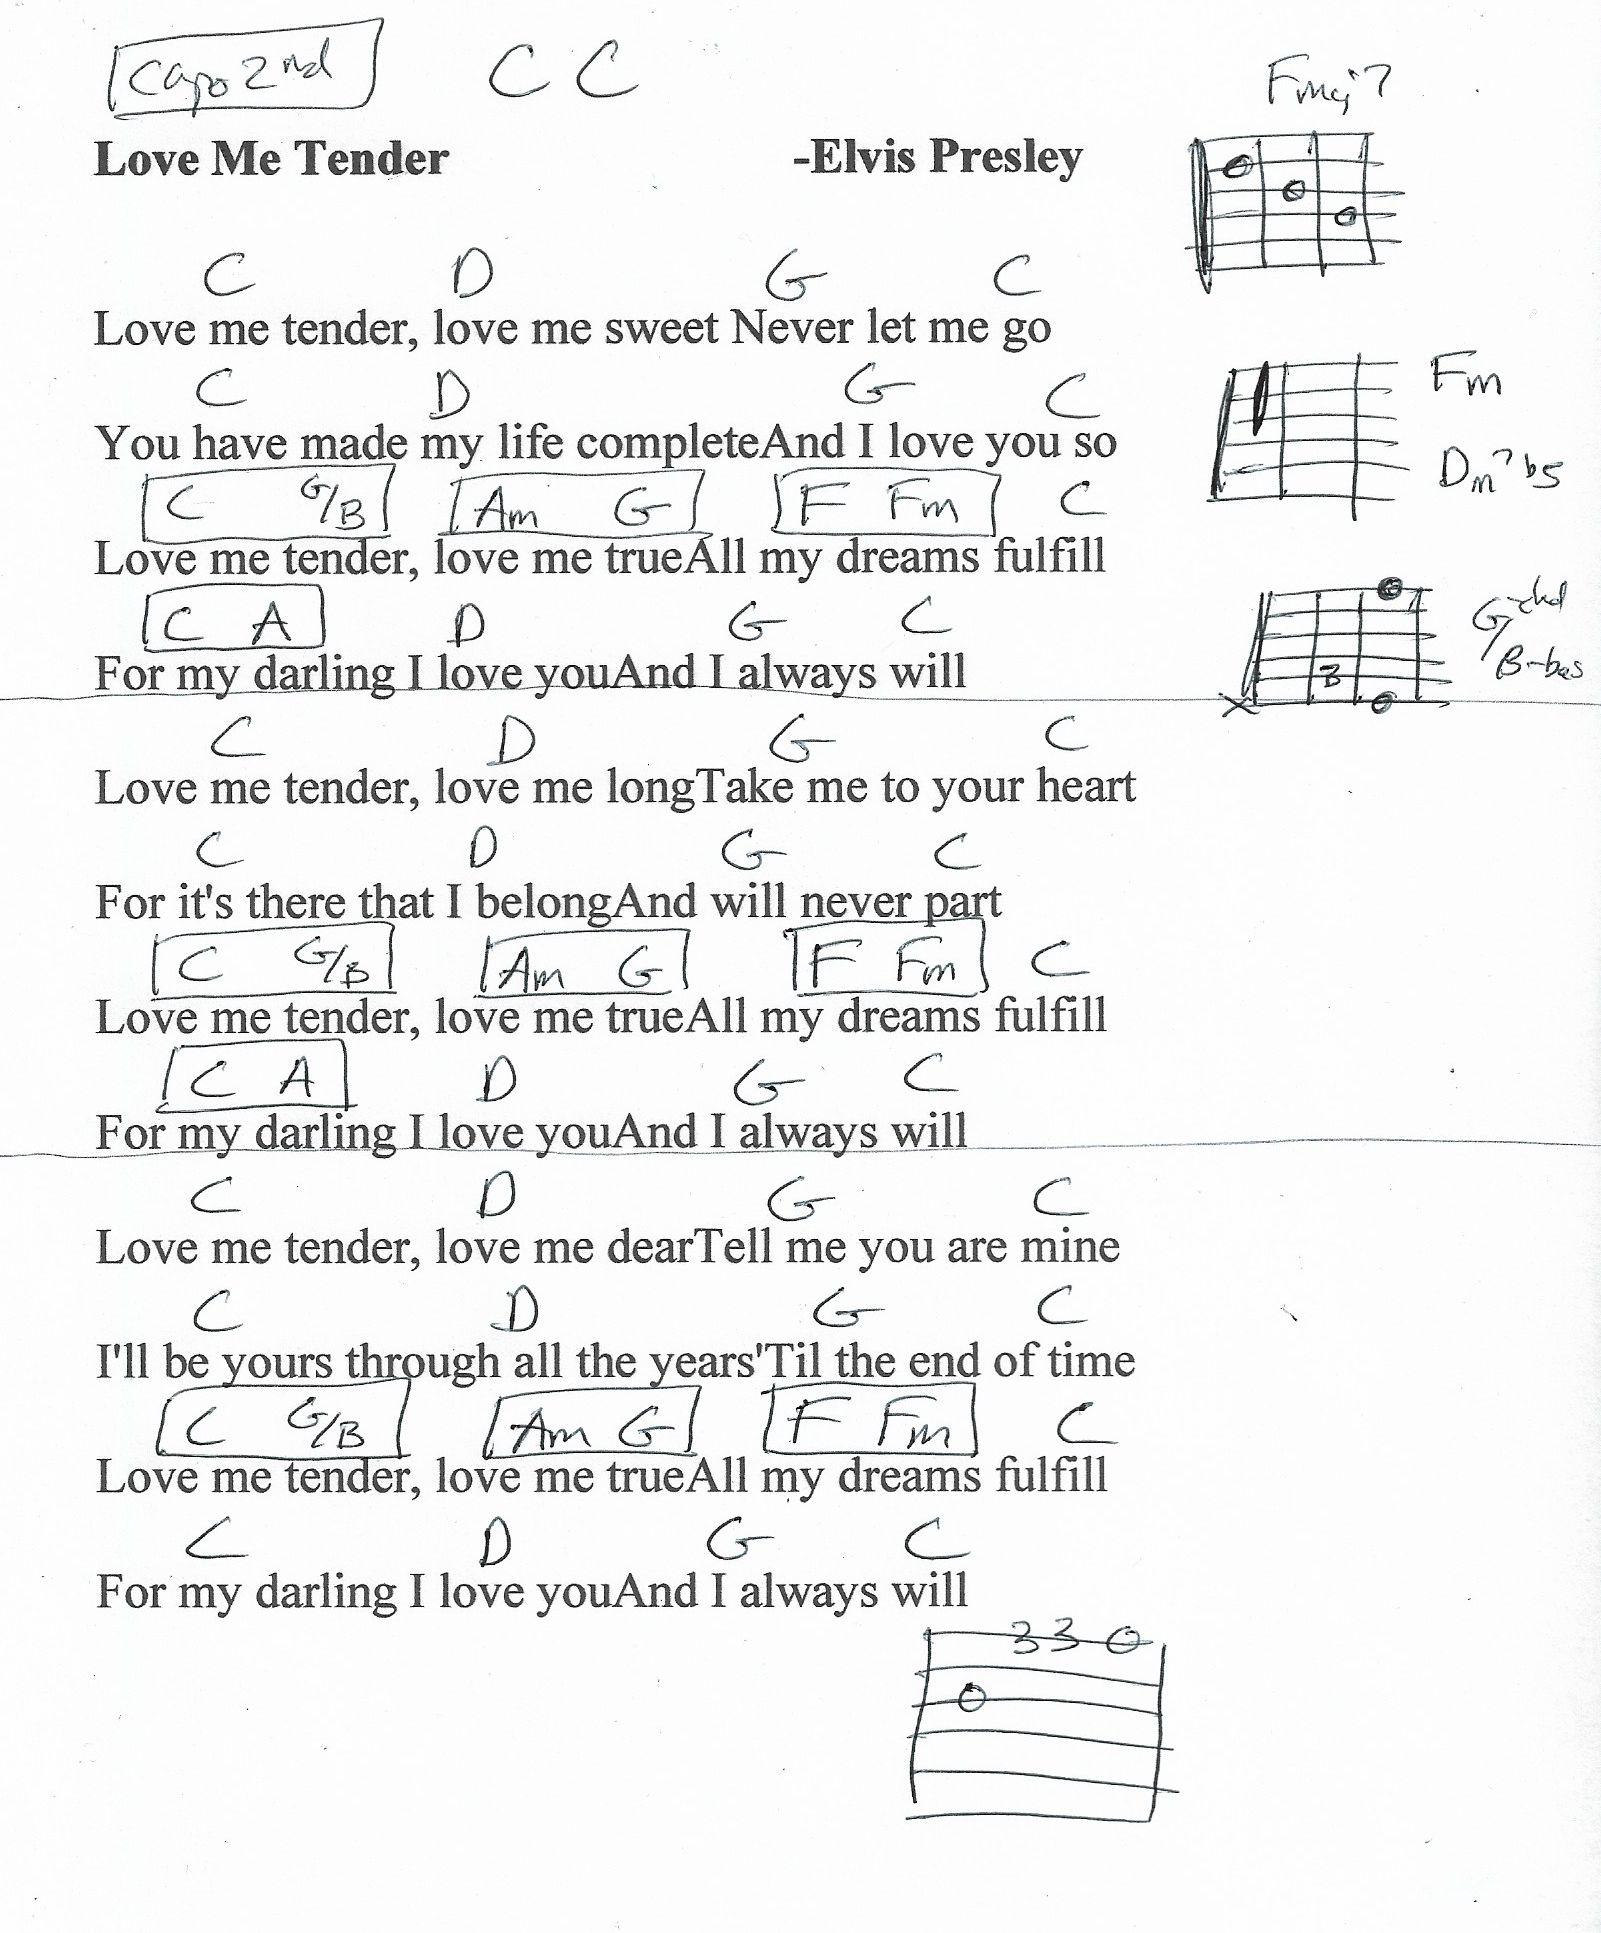 Love Me Tender Sheet Music By Elvis Presley Ukulele Lyrics Chords 122968 Ukulelelessons Gitarren Songs Ukulele Lieder Gitarre Lieder